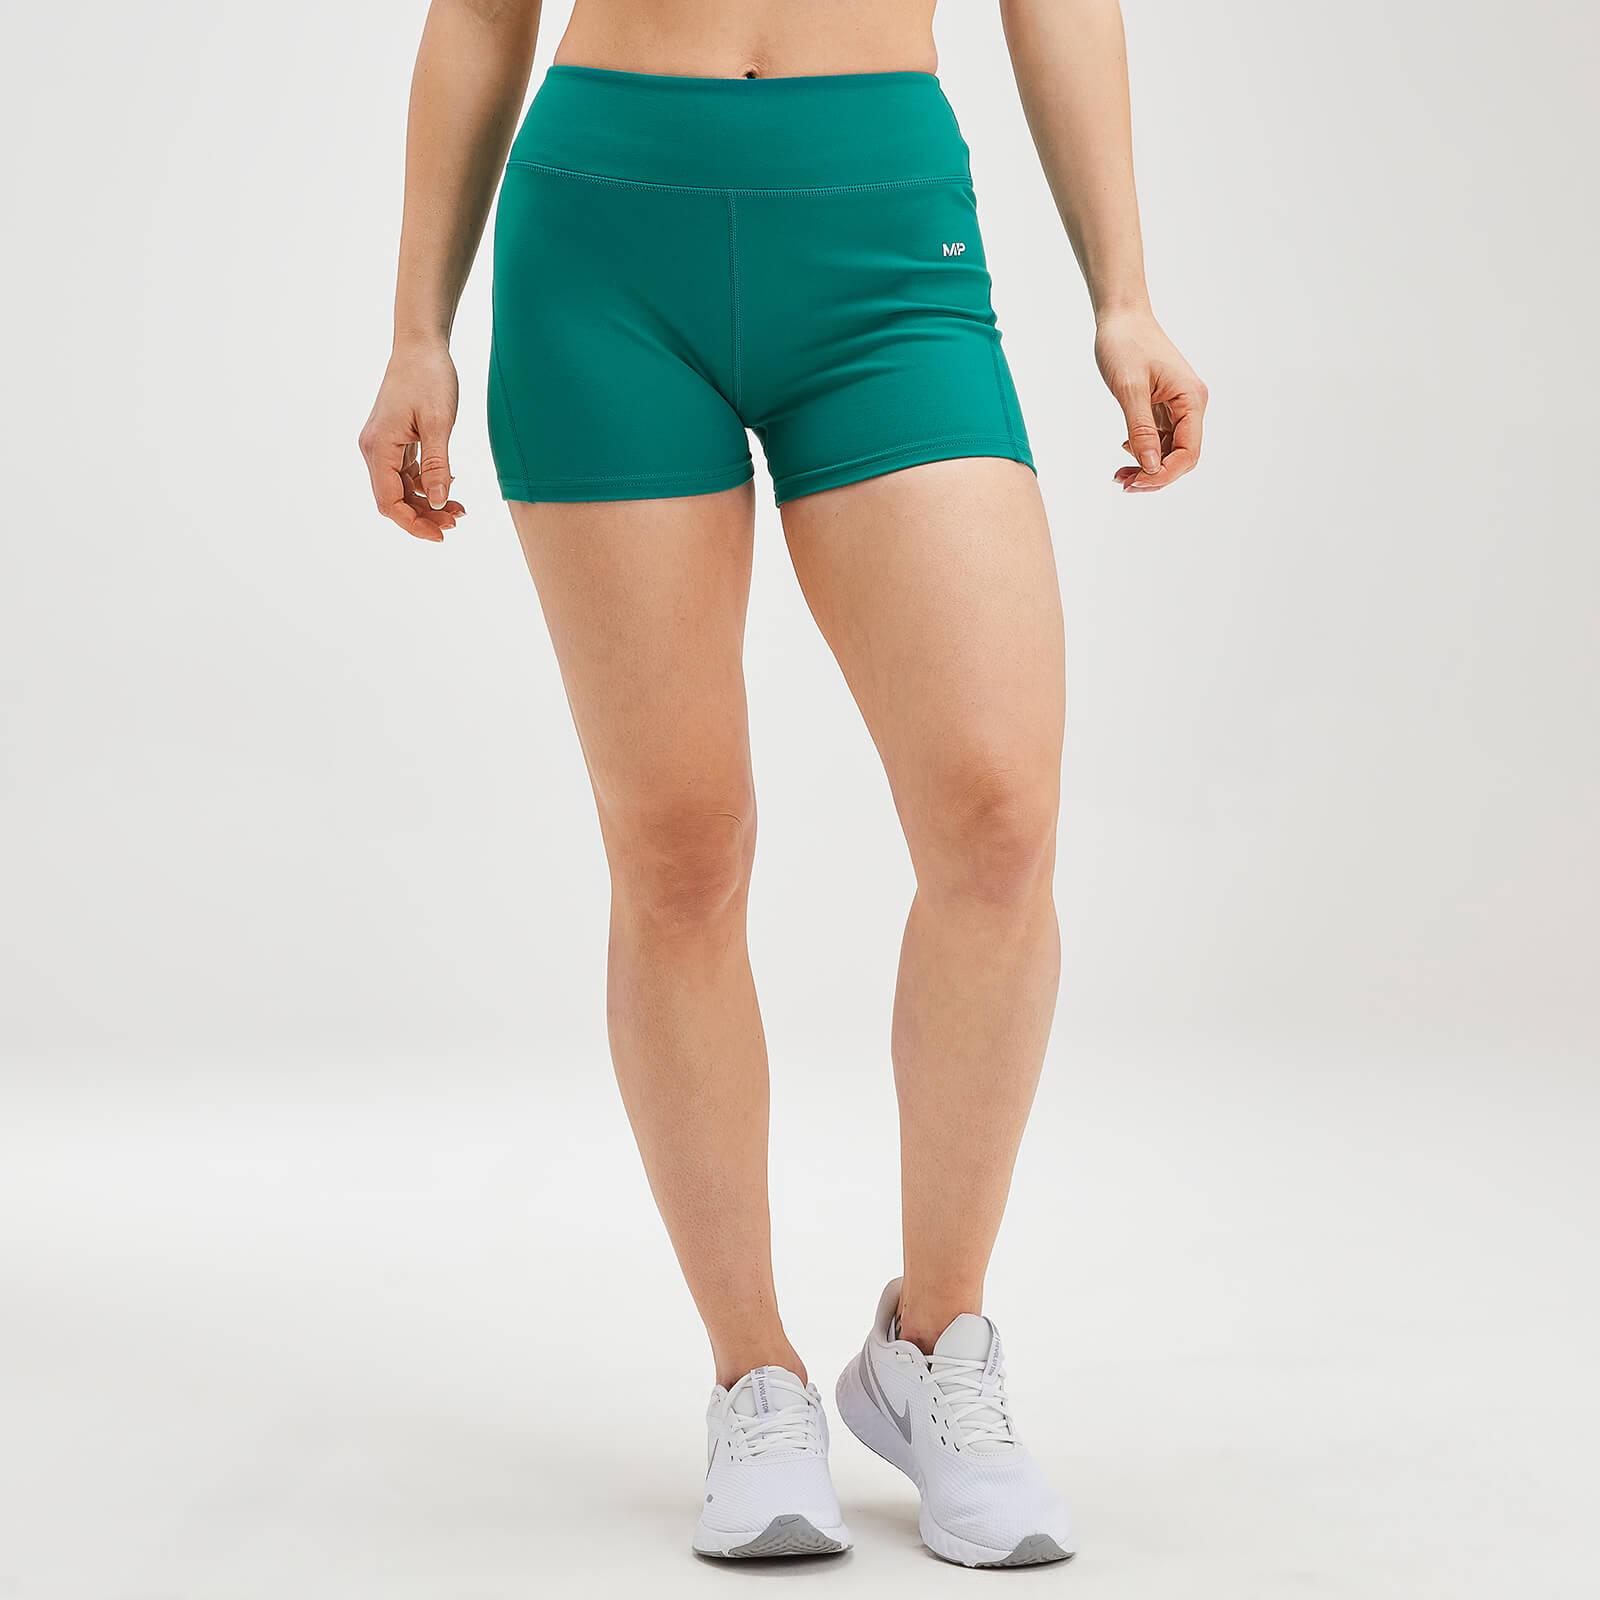 MP Women's Power Shorts - Energy Green - XXS